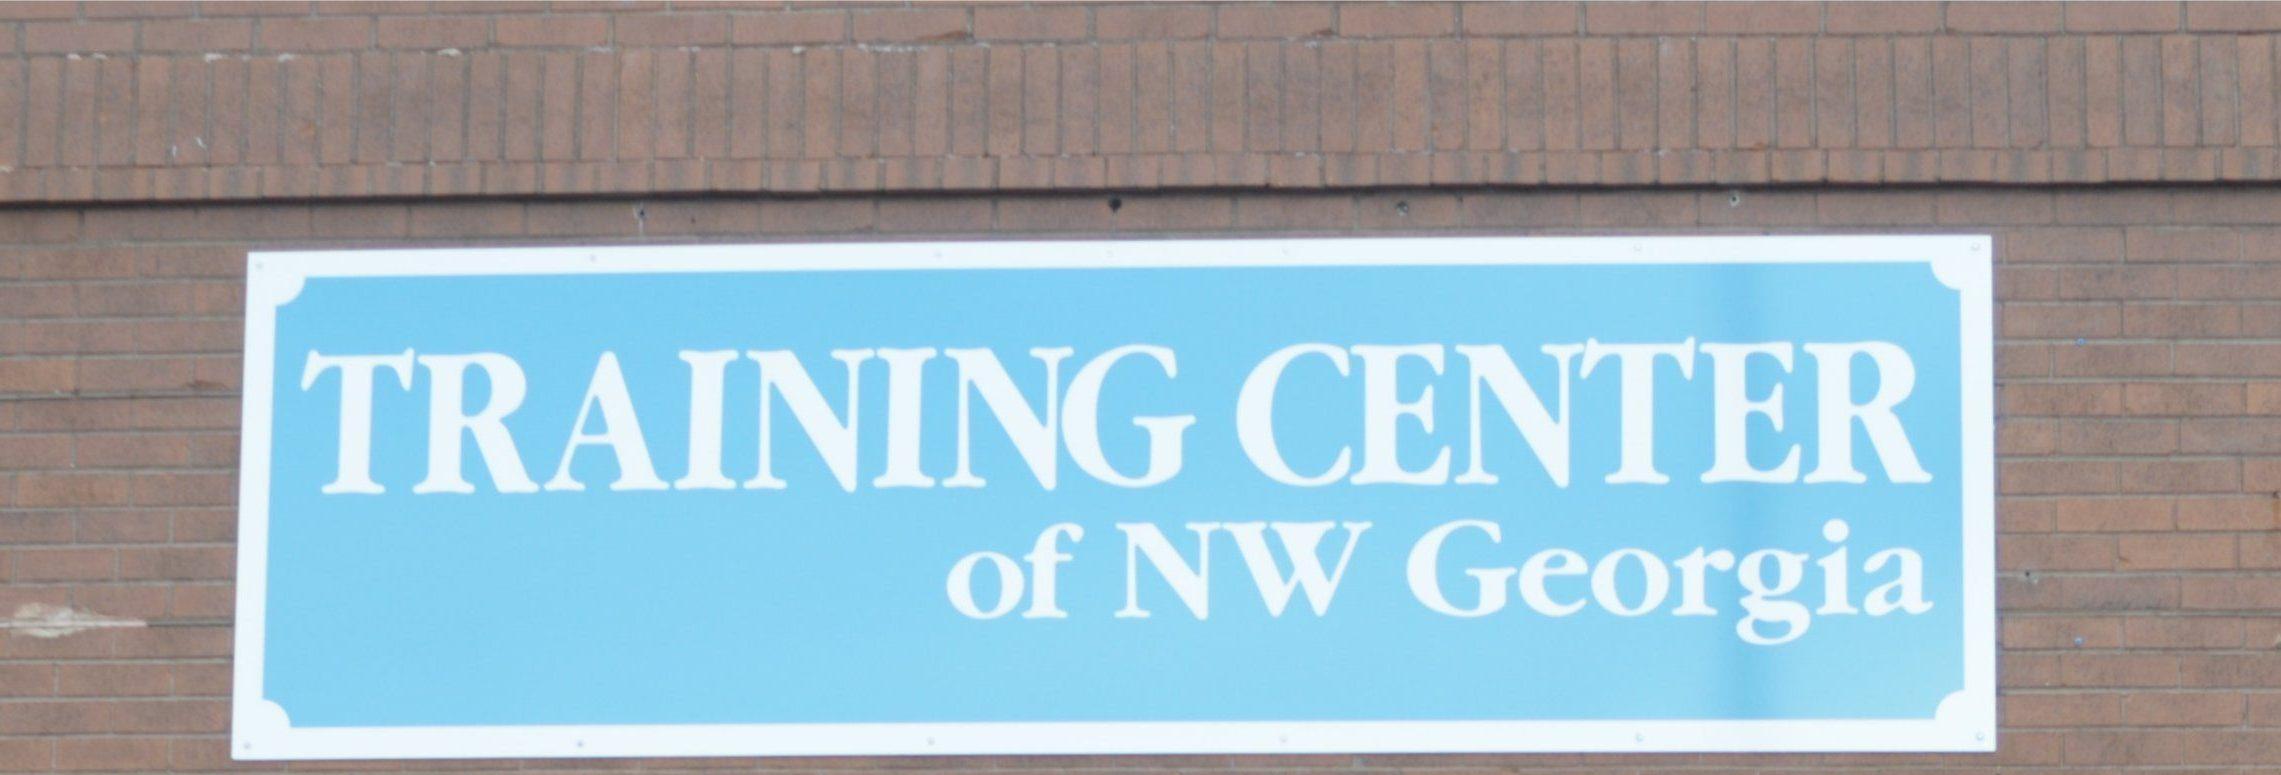 THE TRAINING CENTER OF NW GEORGIA